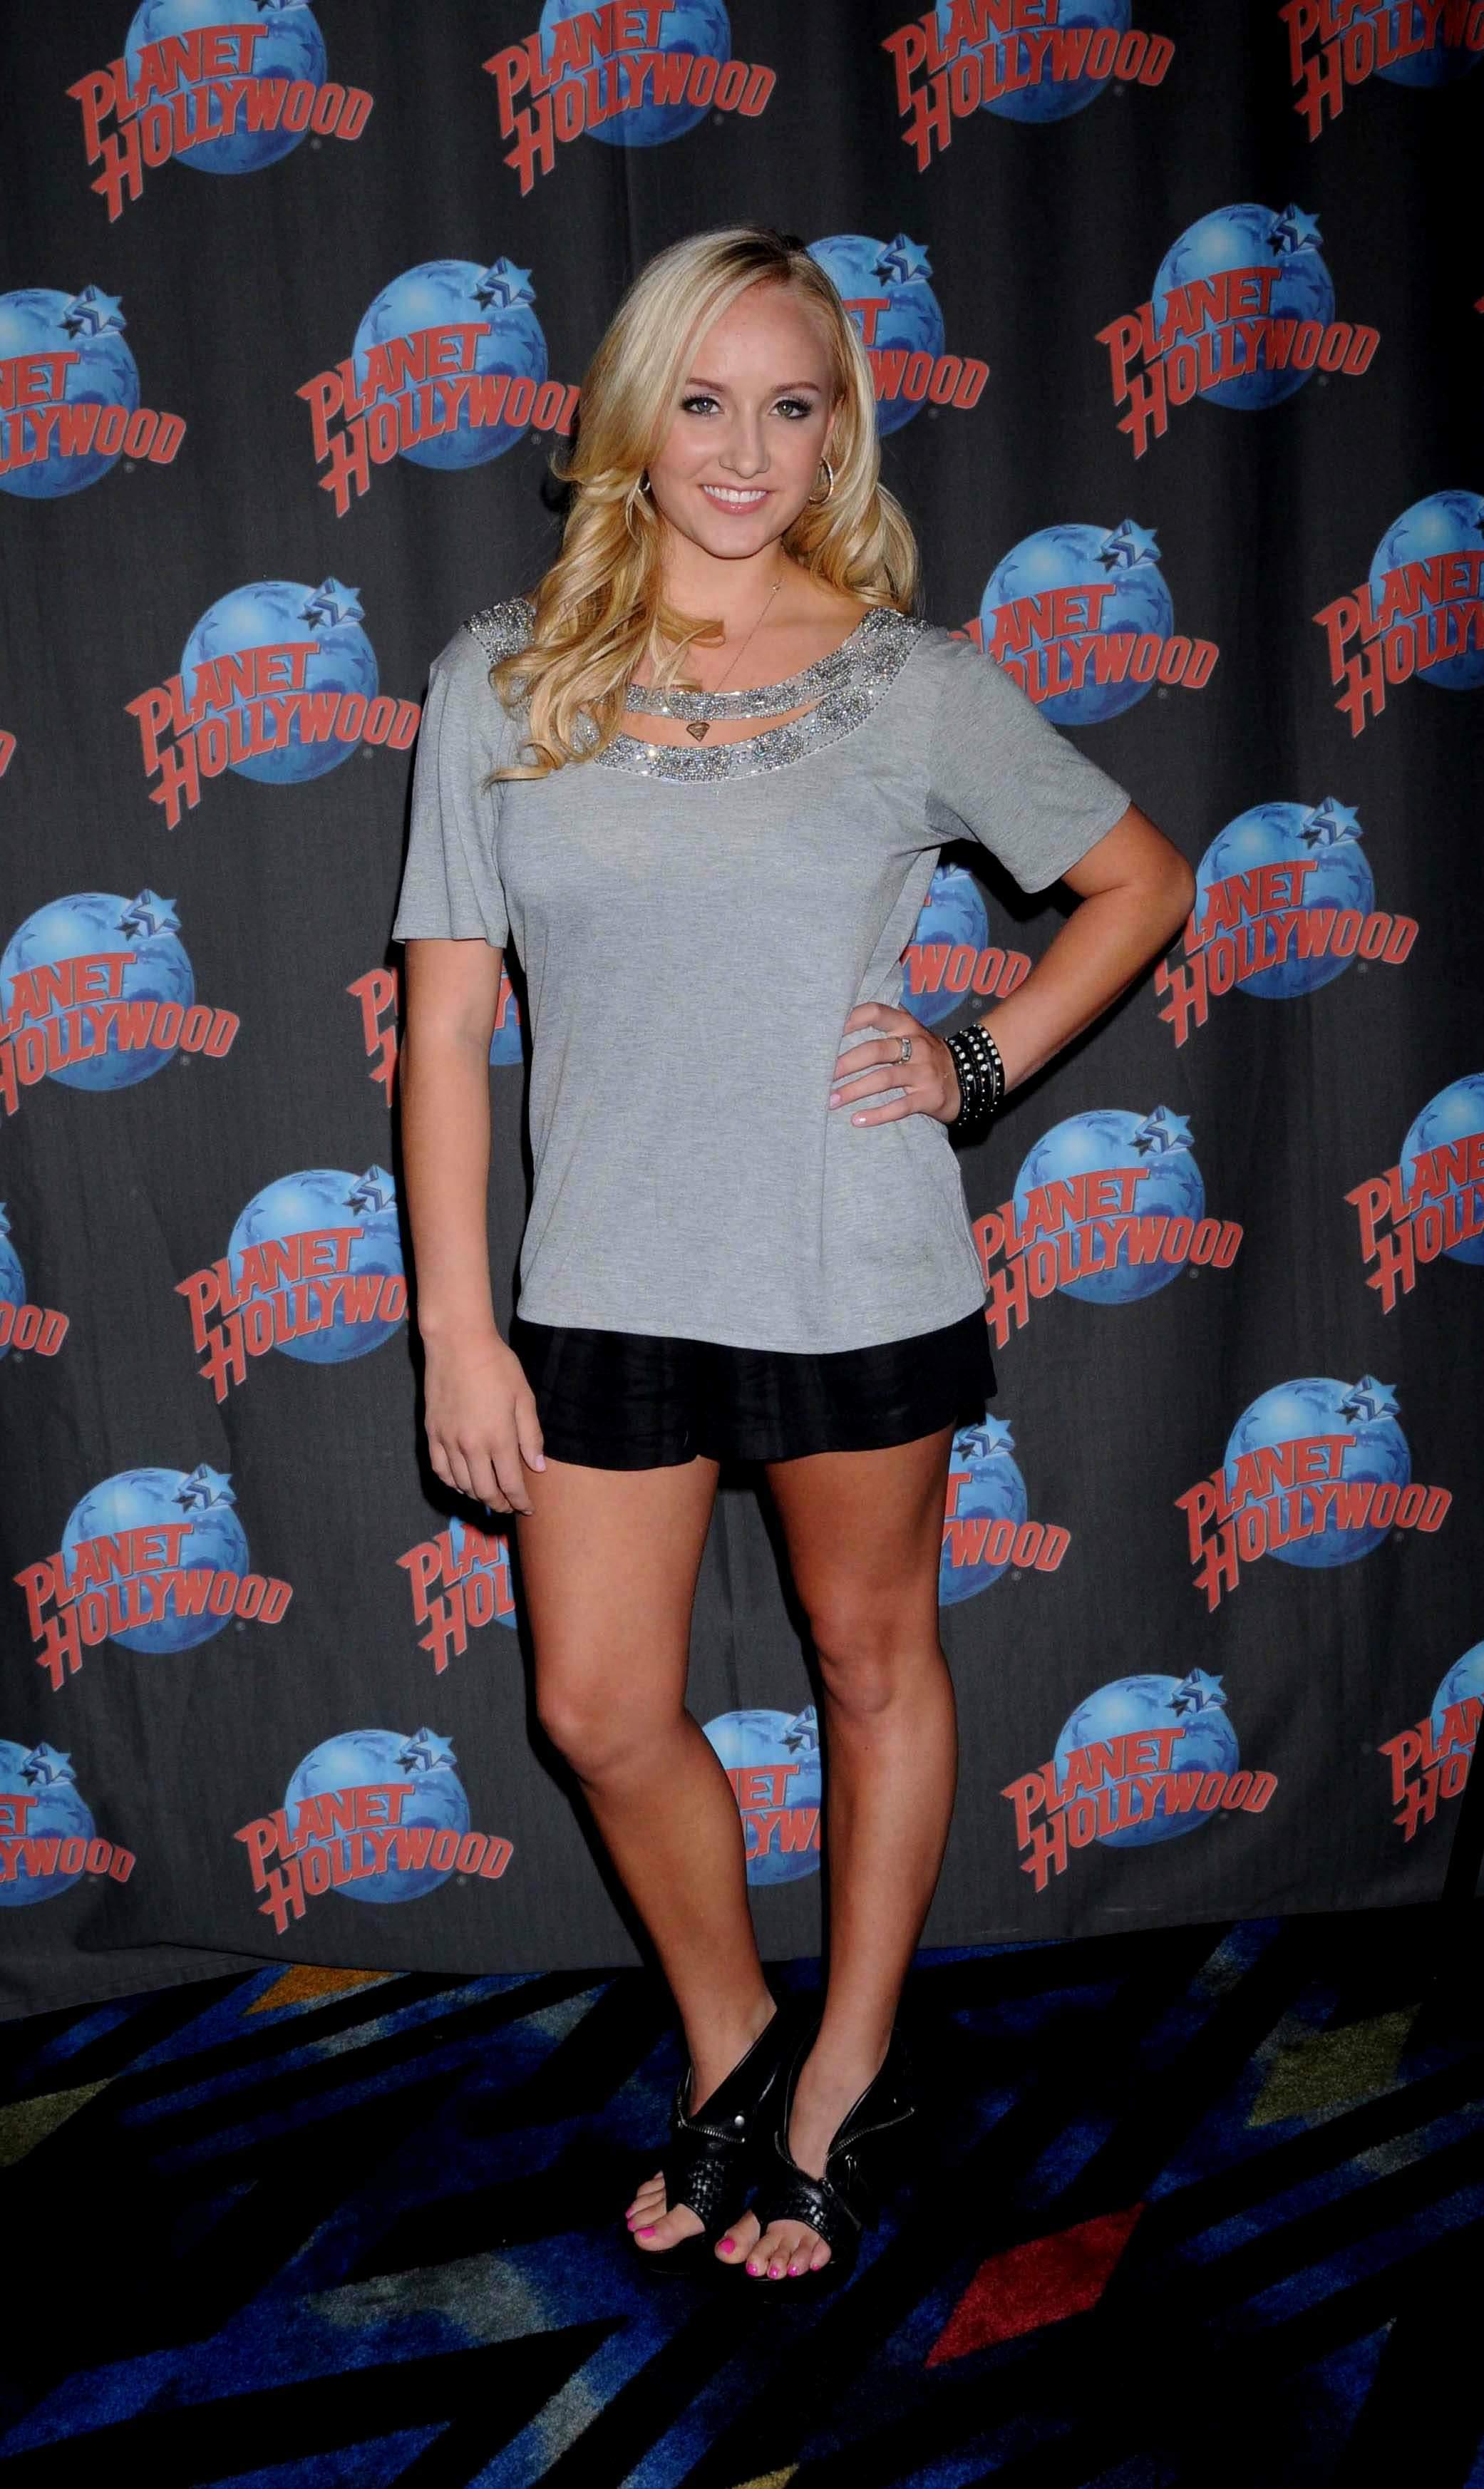 116865381_Nastia_liukin_promotes_Supergirl_clothing_line_at_Planet_Hollywood_1_122_157lo.jpg